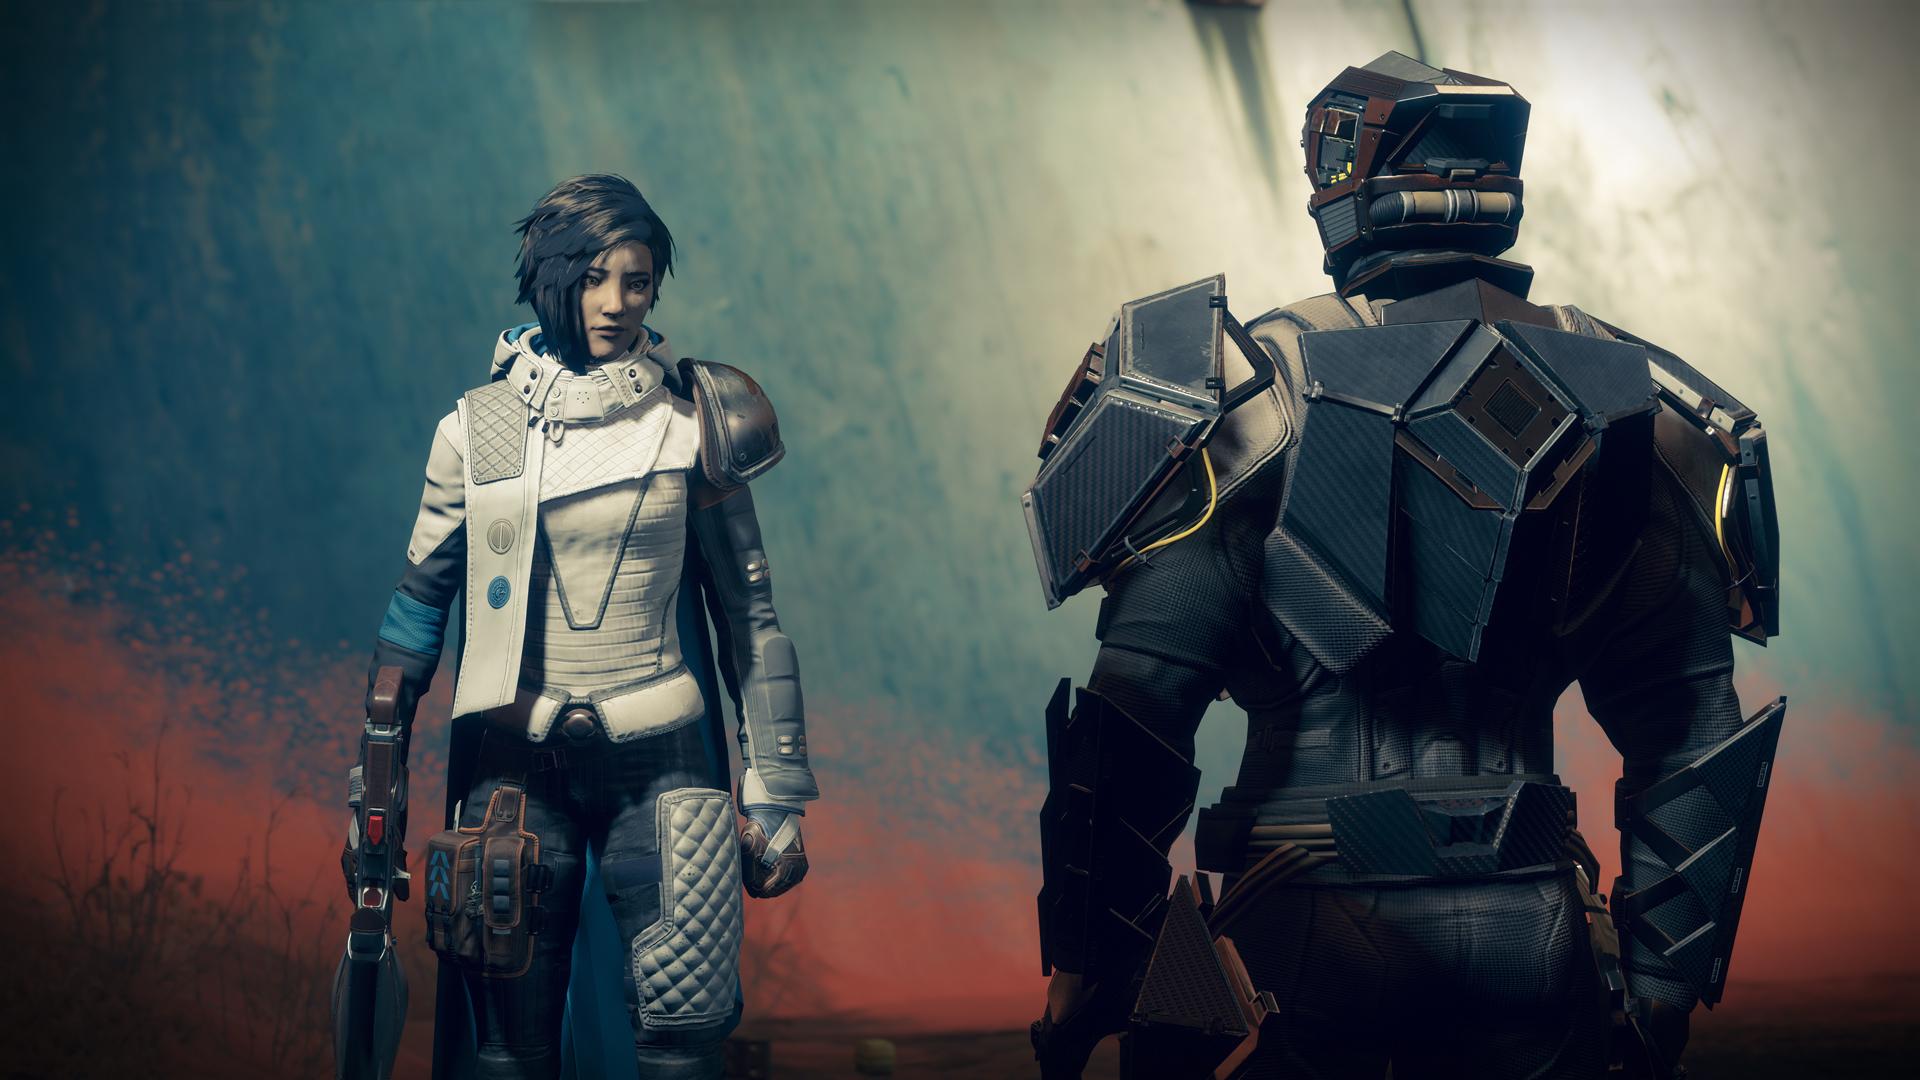 Destiny 2: Warmind. Image: Activision